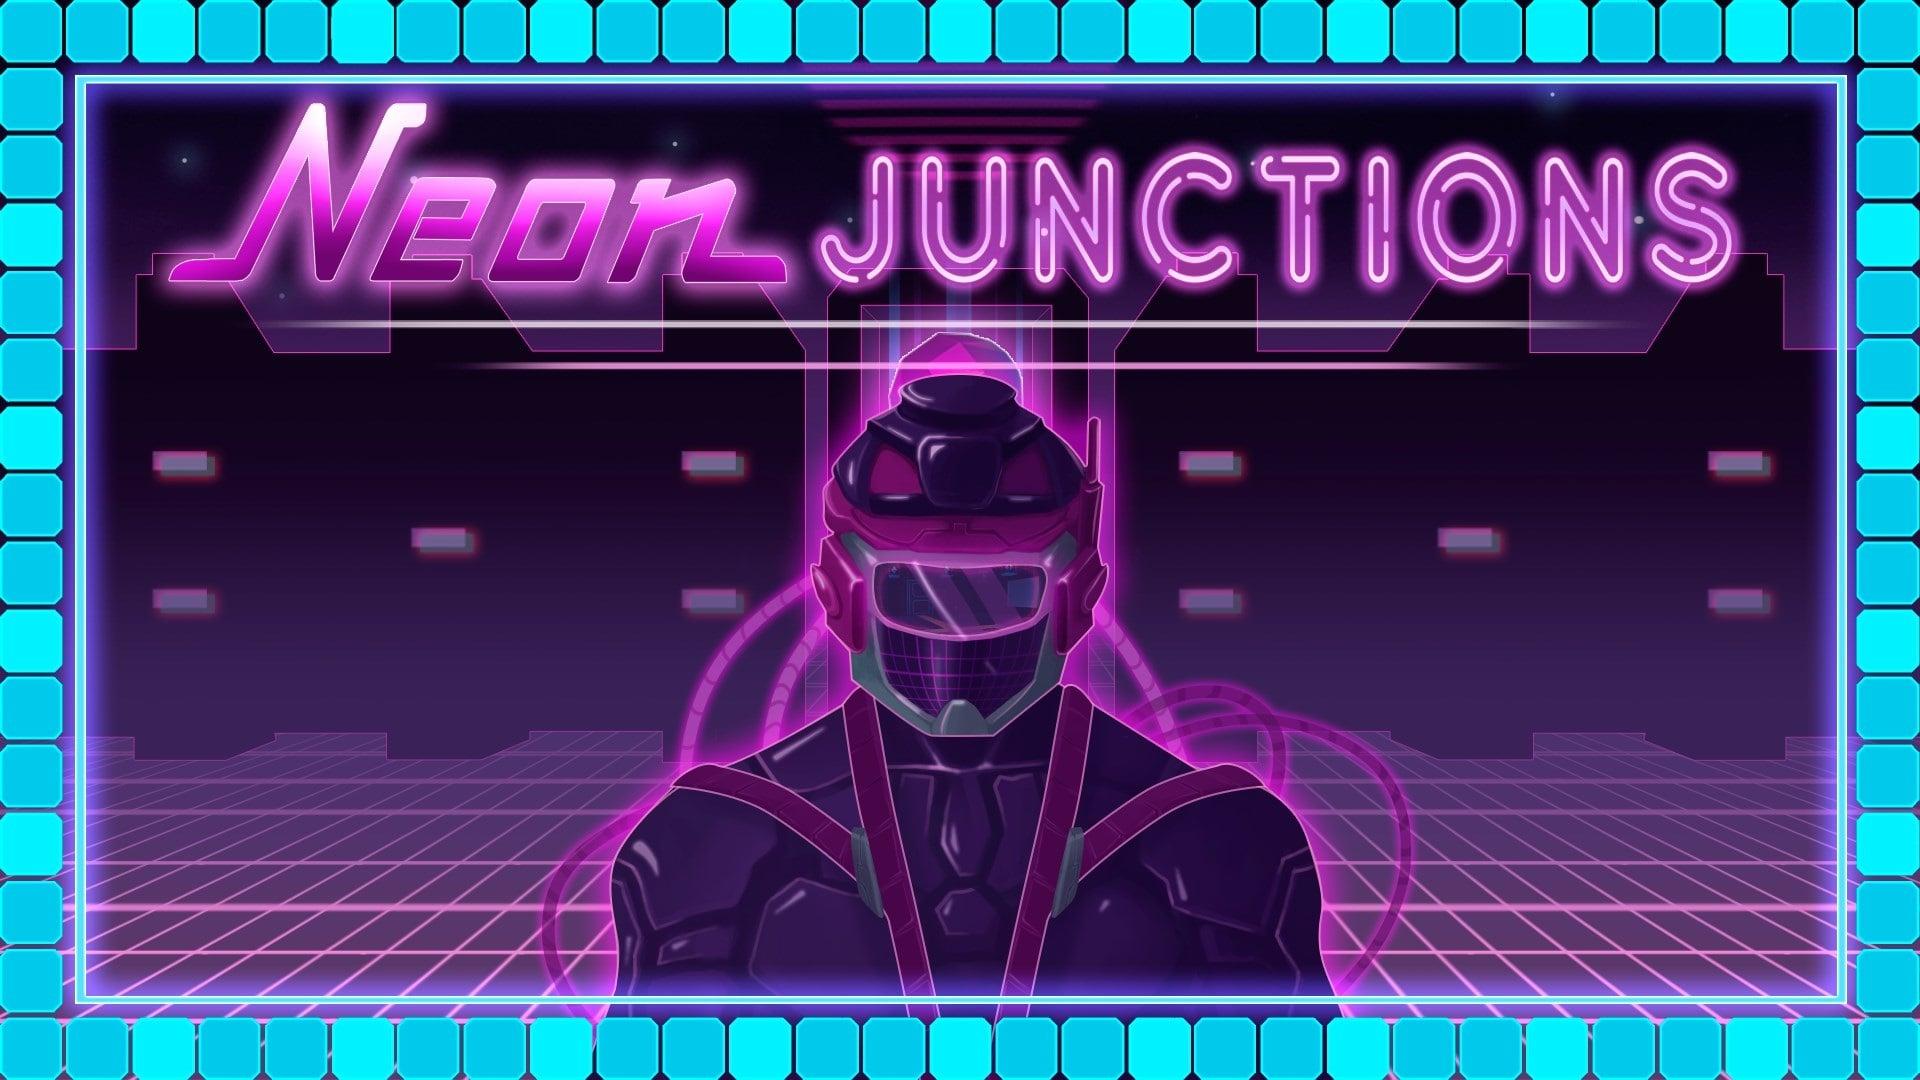 Neon Junctions Achievements